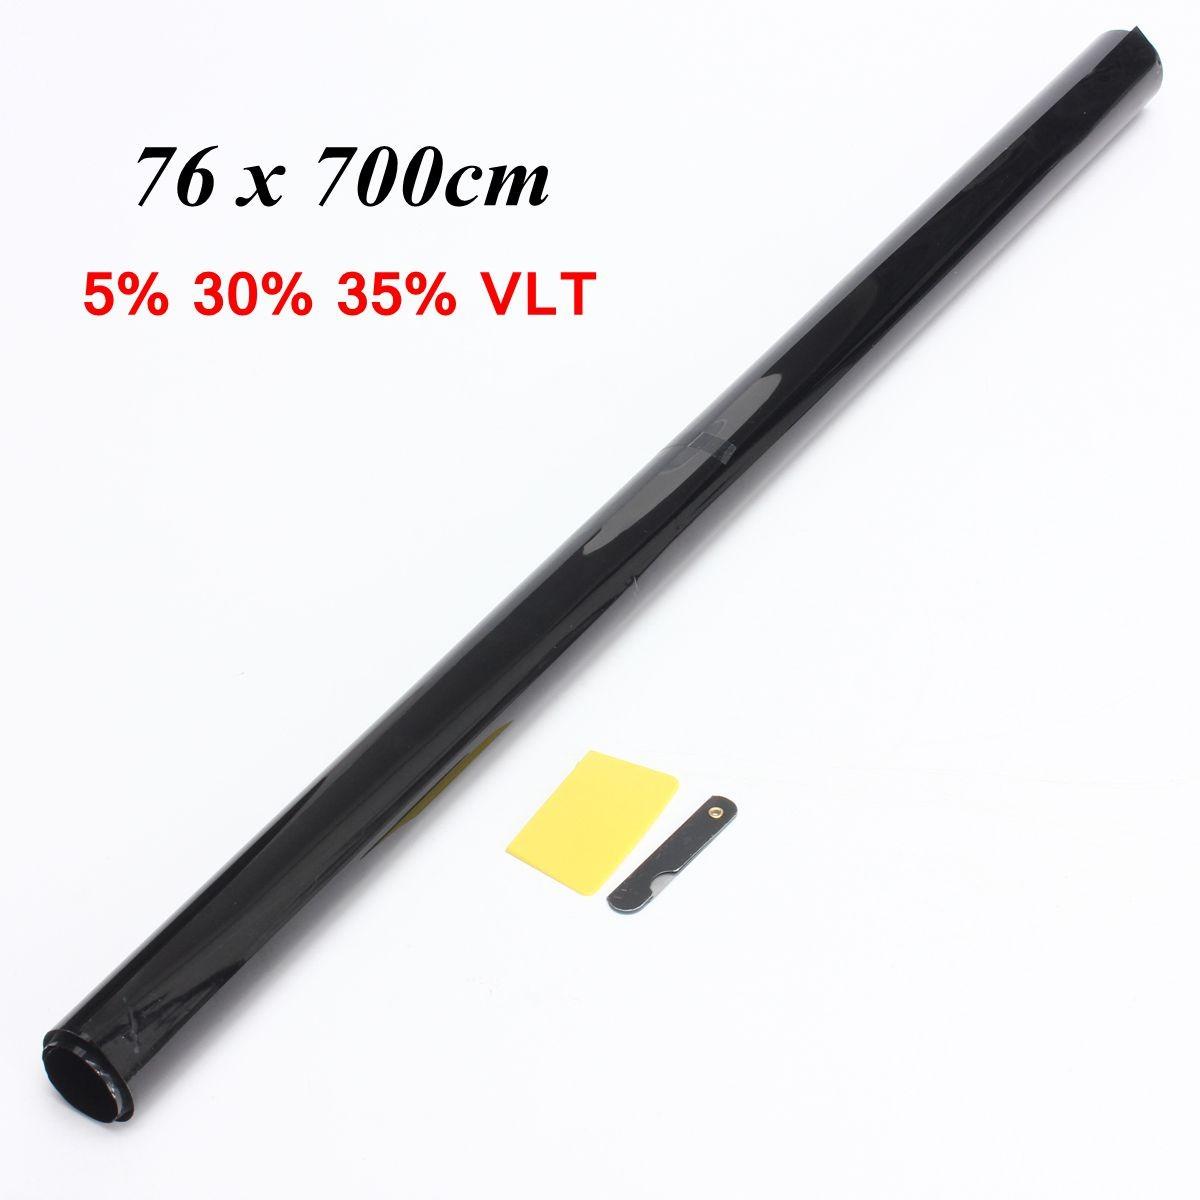 76 x 700cm 5% 30% 35% VLT Solar Protect Black Smoke Car Auto Van Home Glass Windows Tint Film Tinting(China (Mainland))